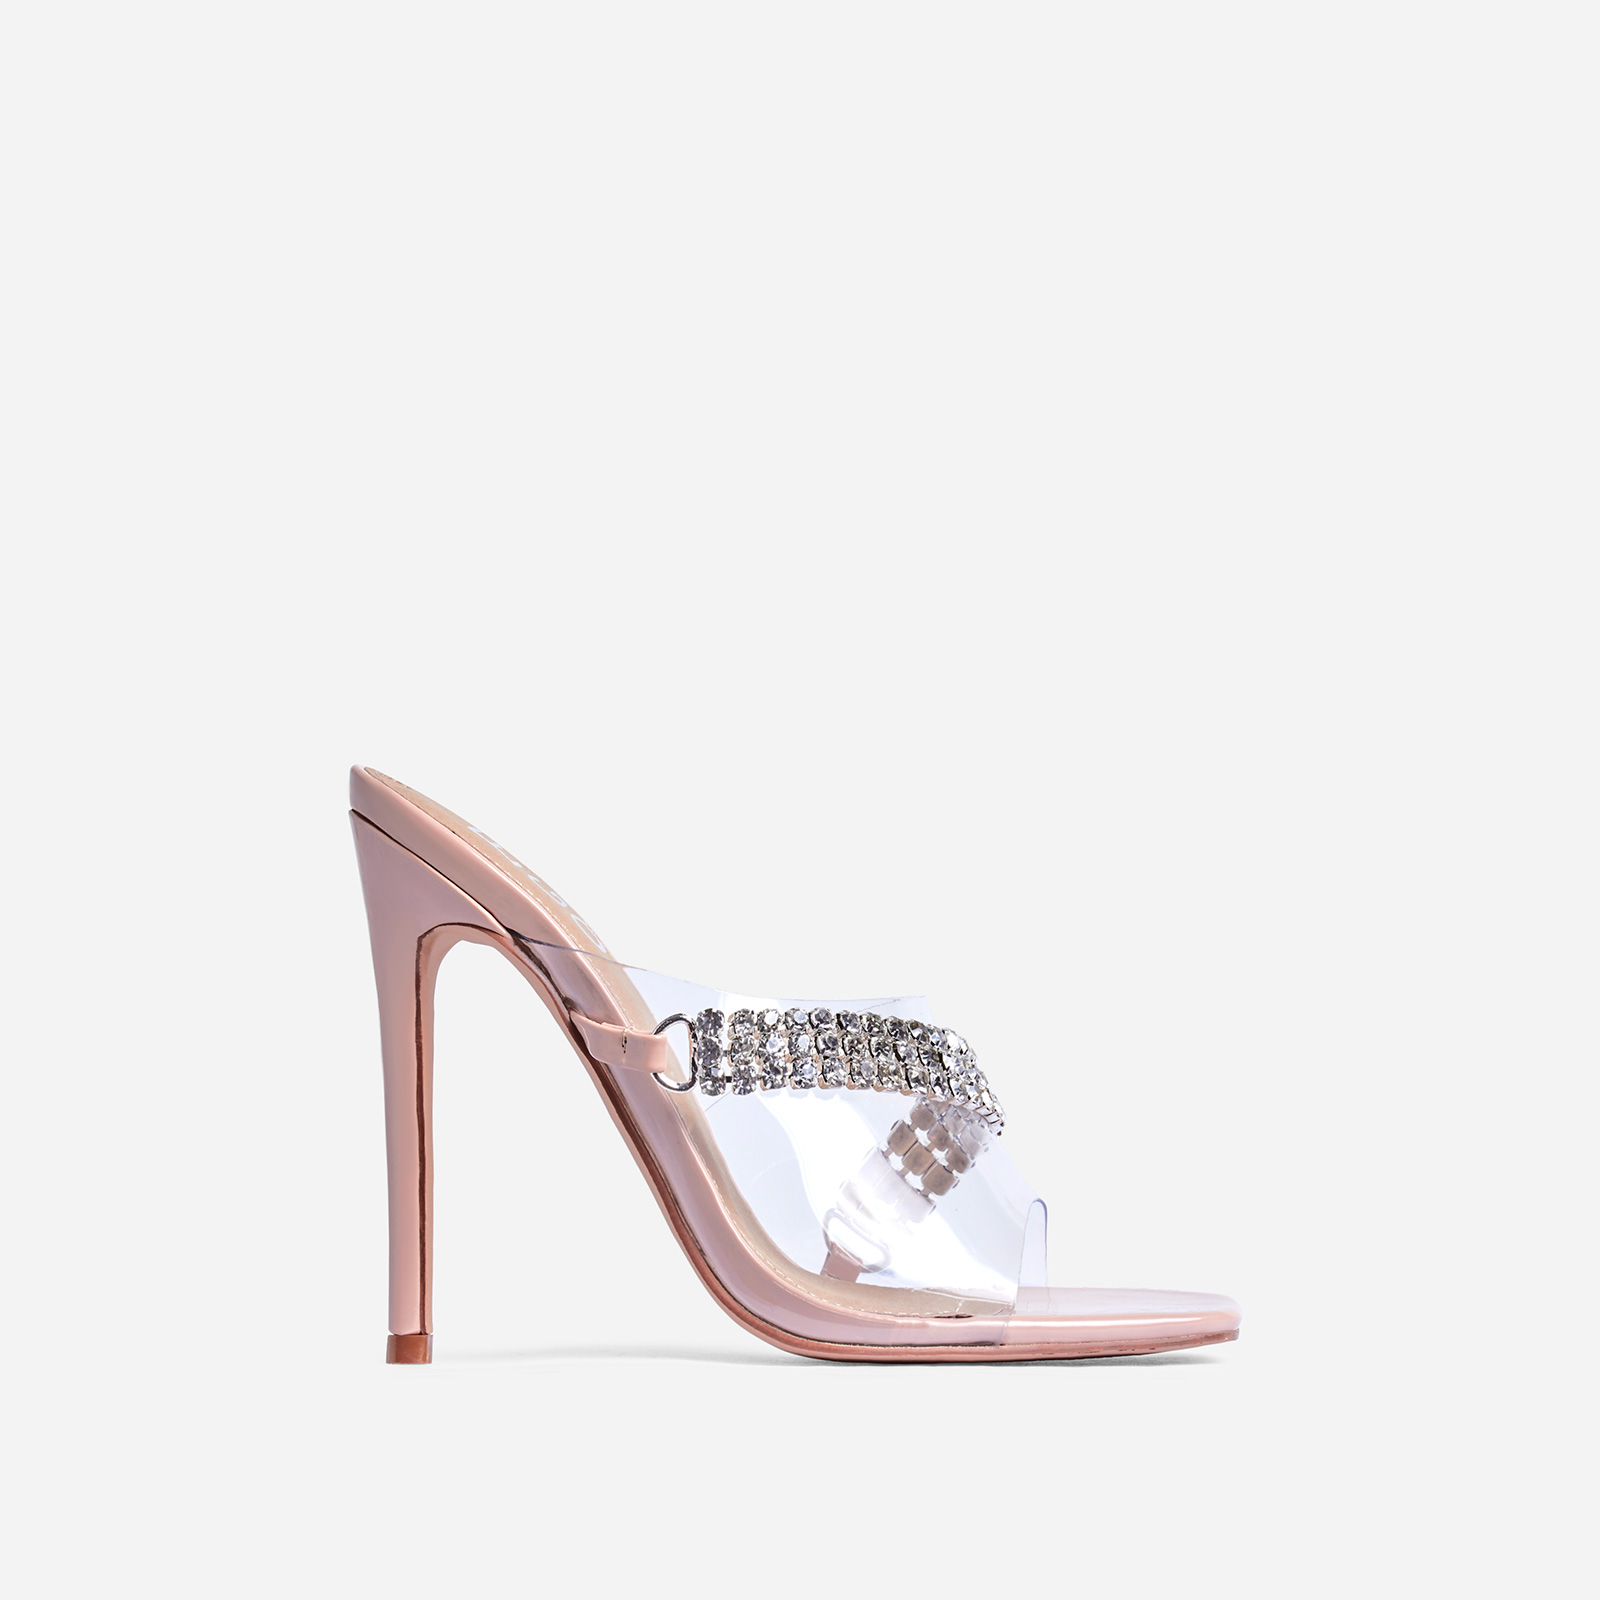 Peggy Diamante Detail Square Peep Toe Heel Mule In Nude Patent